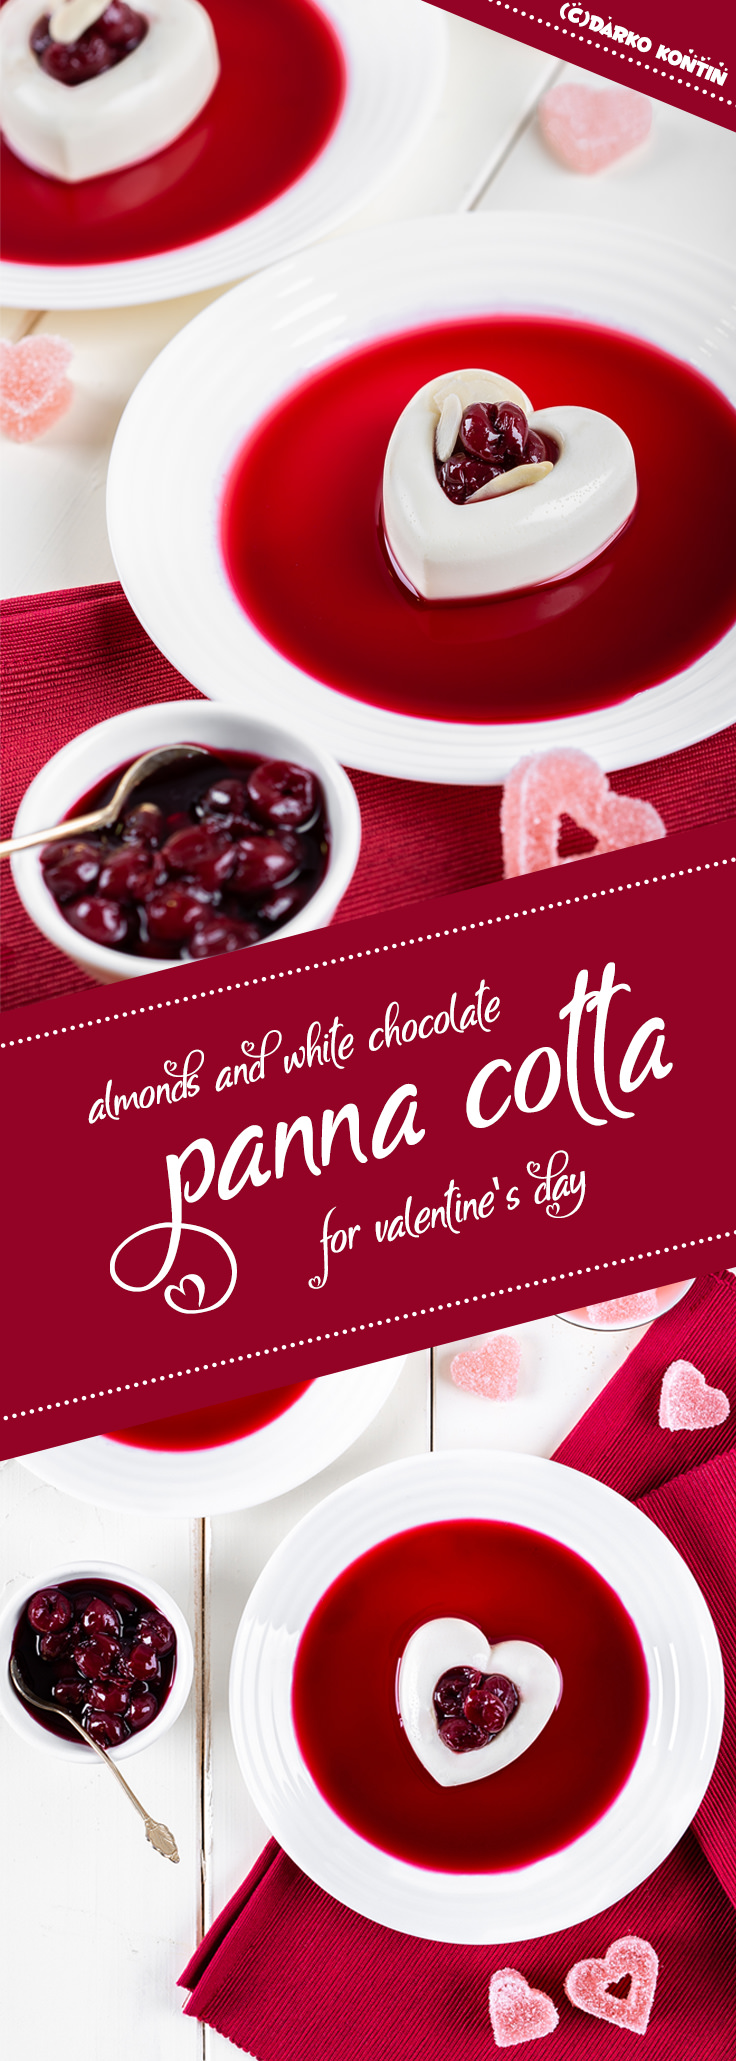 Valentines day almond white chocolate Panna cotta Pinterest